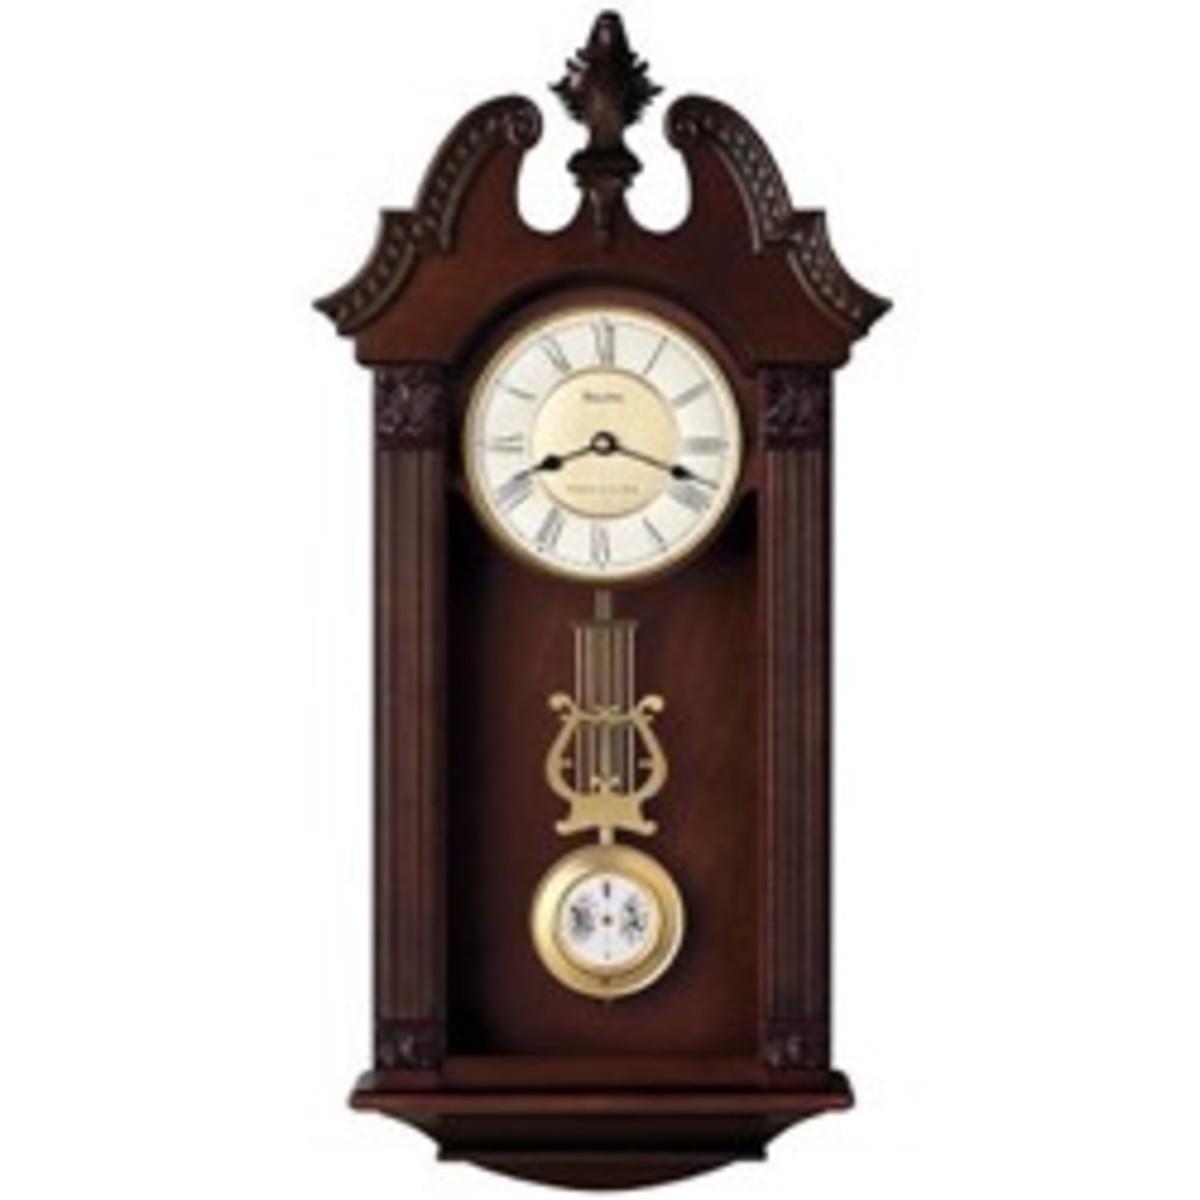 Bulova Ridgedale Chime Wall Clock